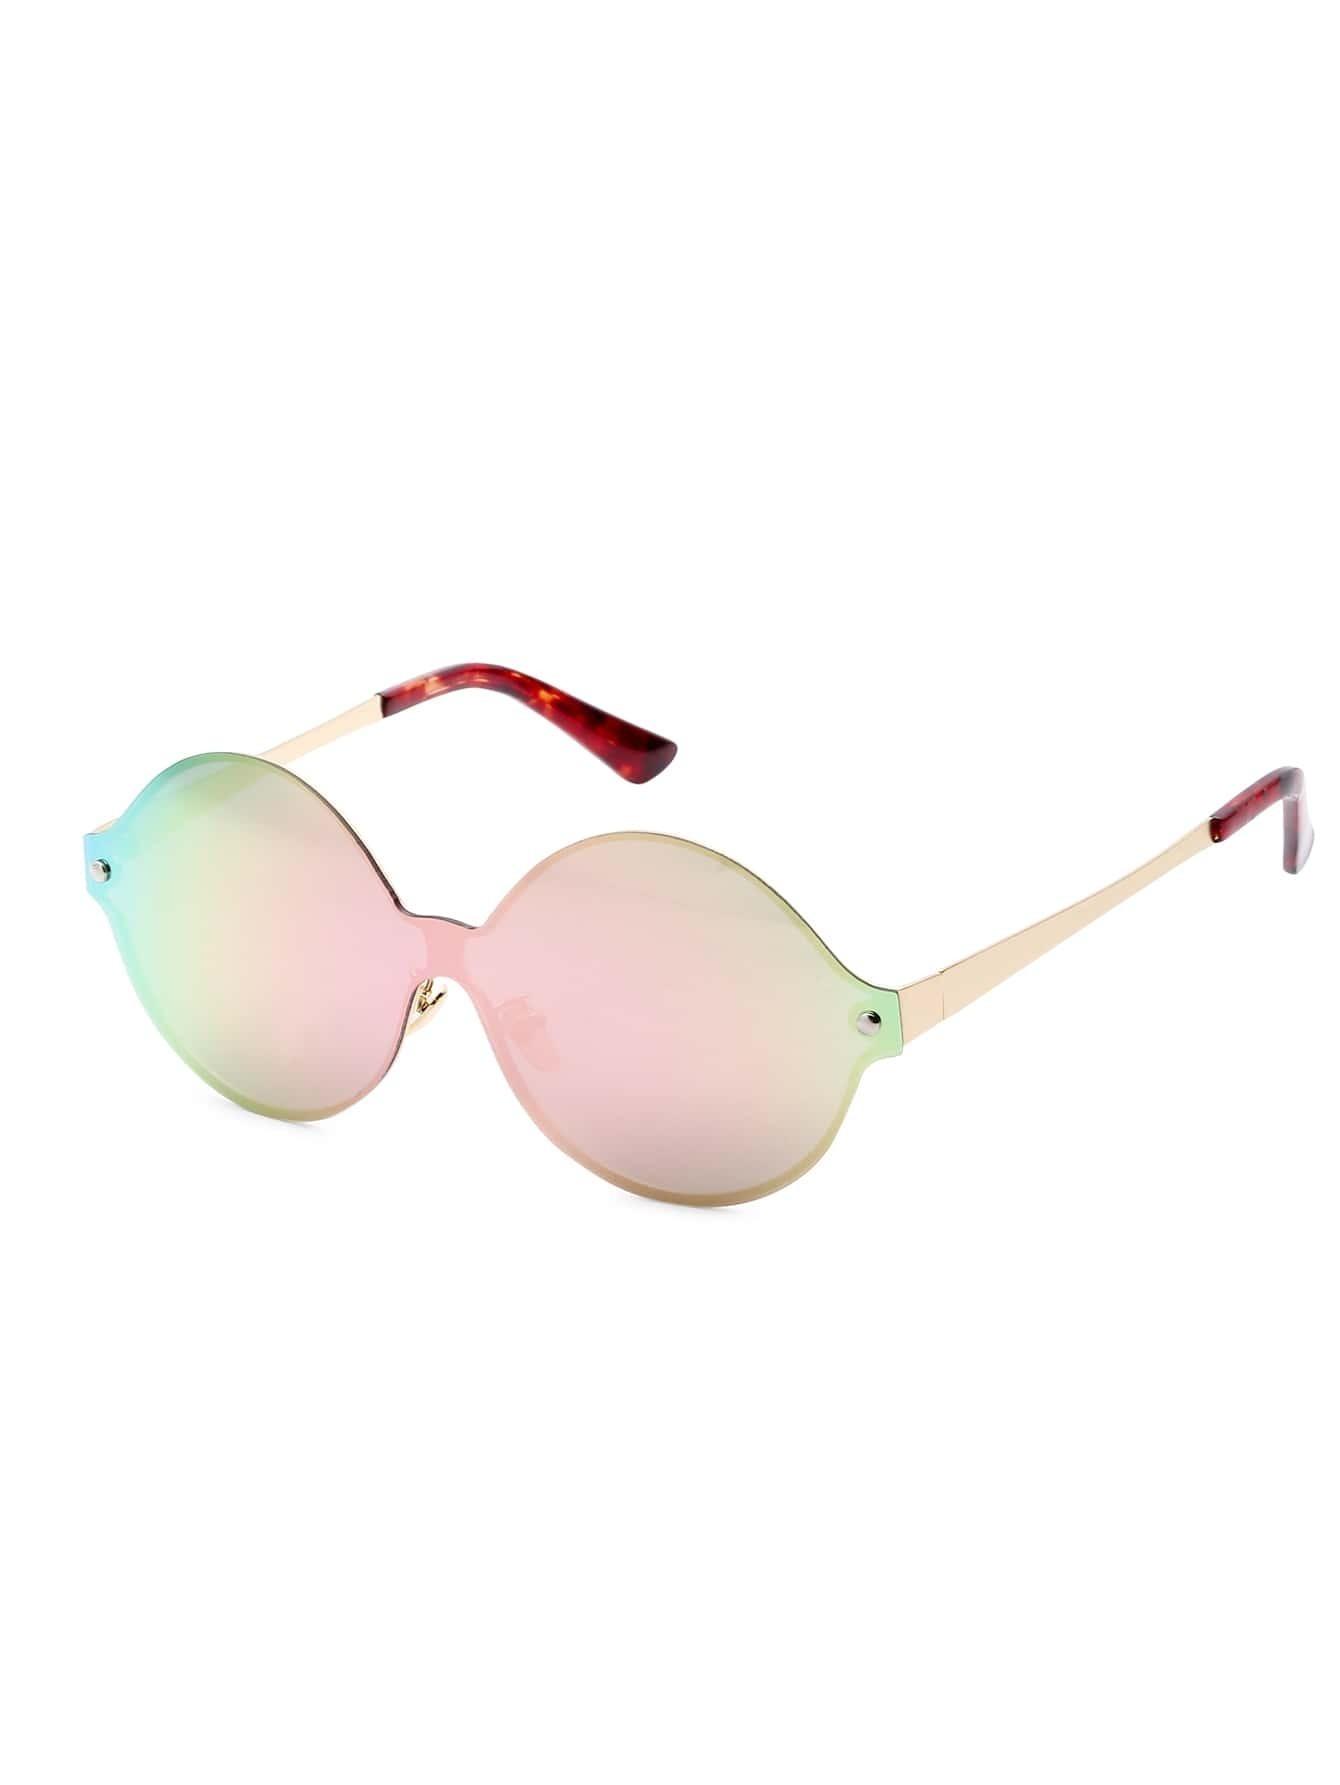 Pink Lens Round Design Sunglasses